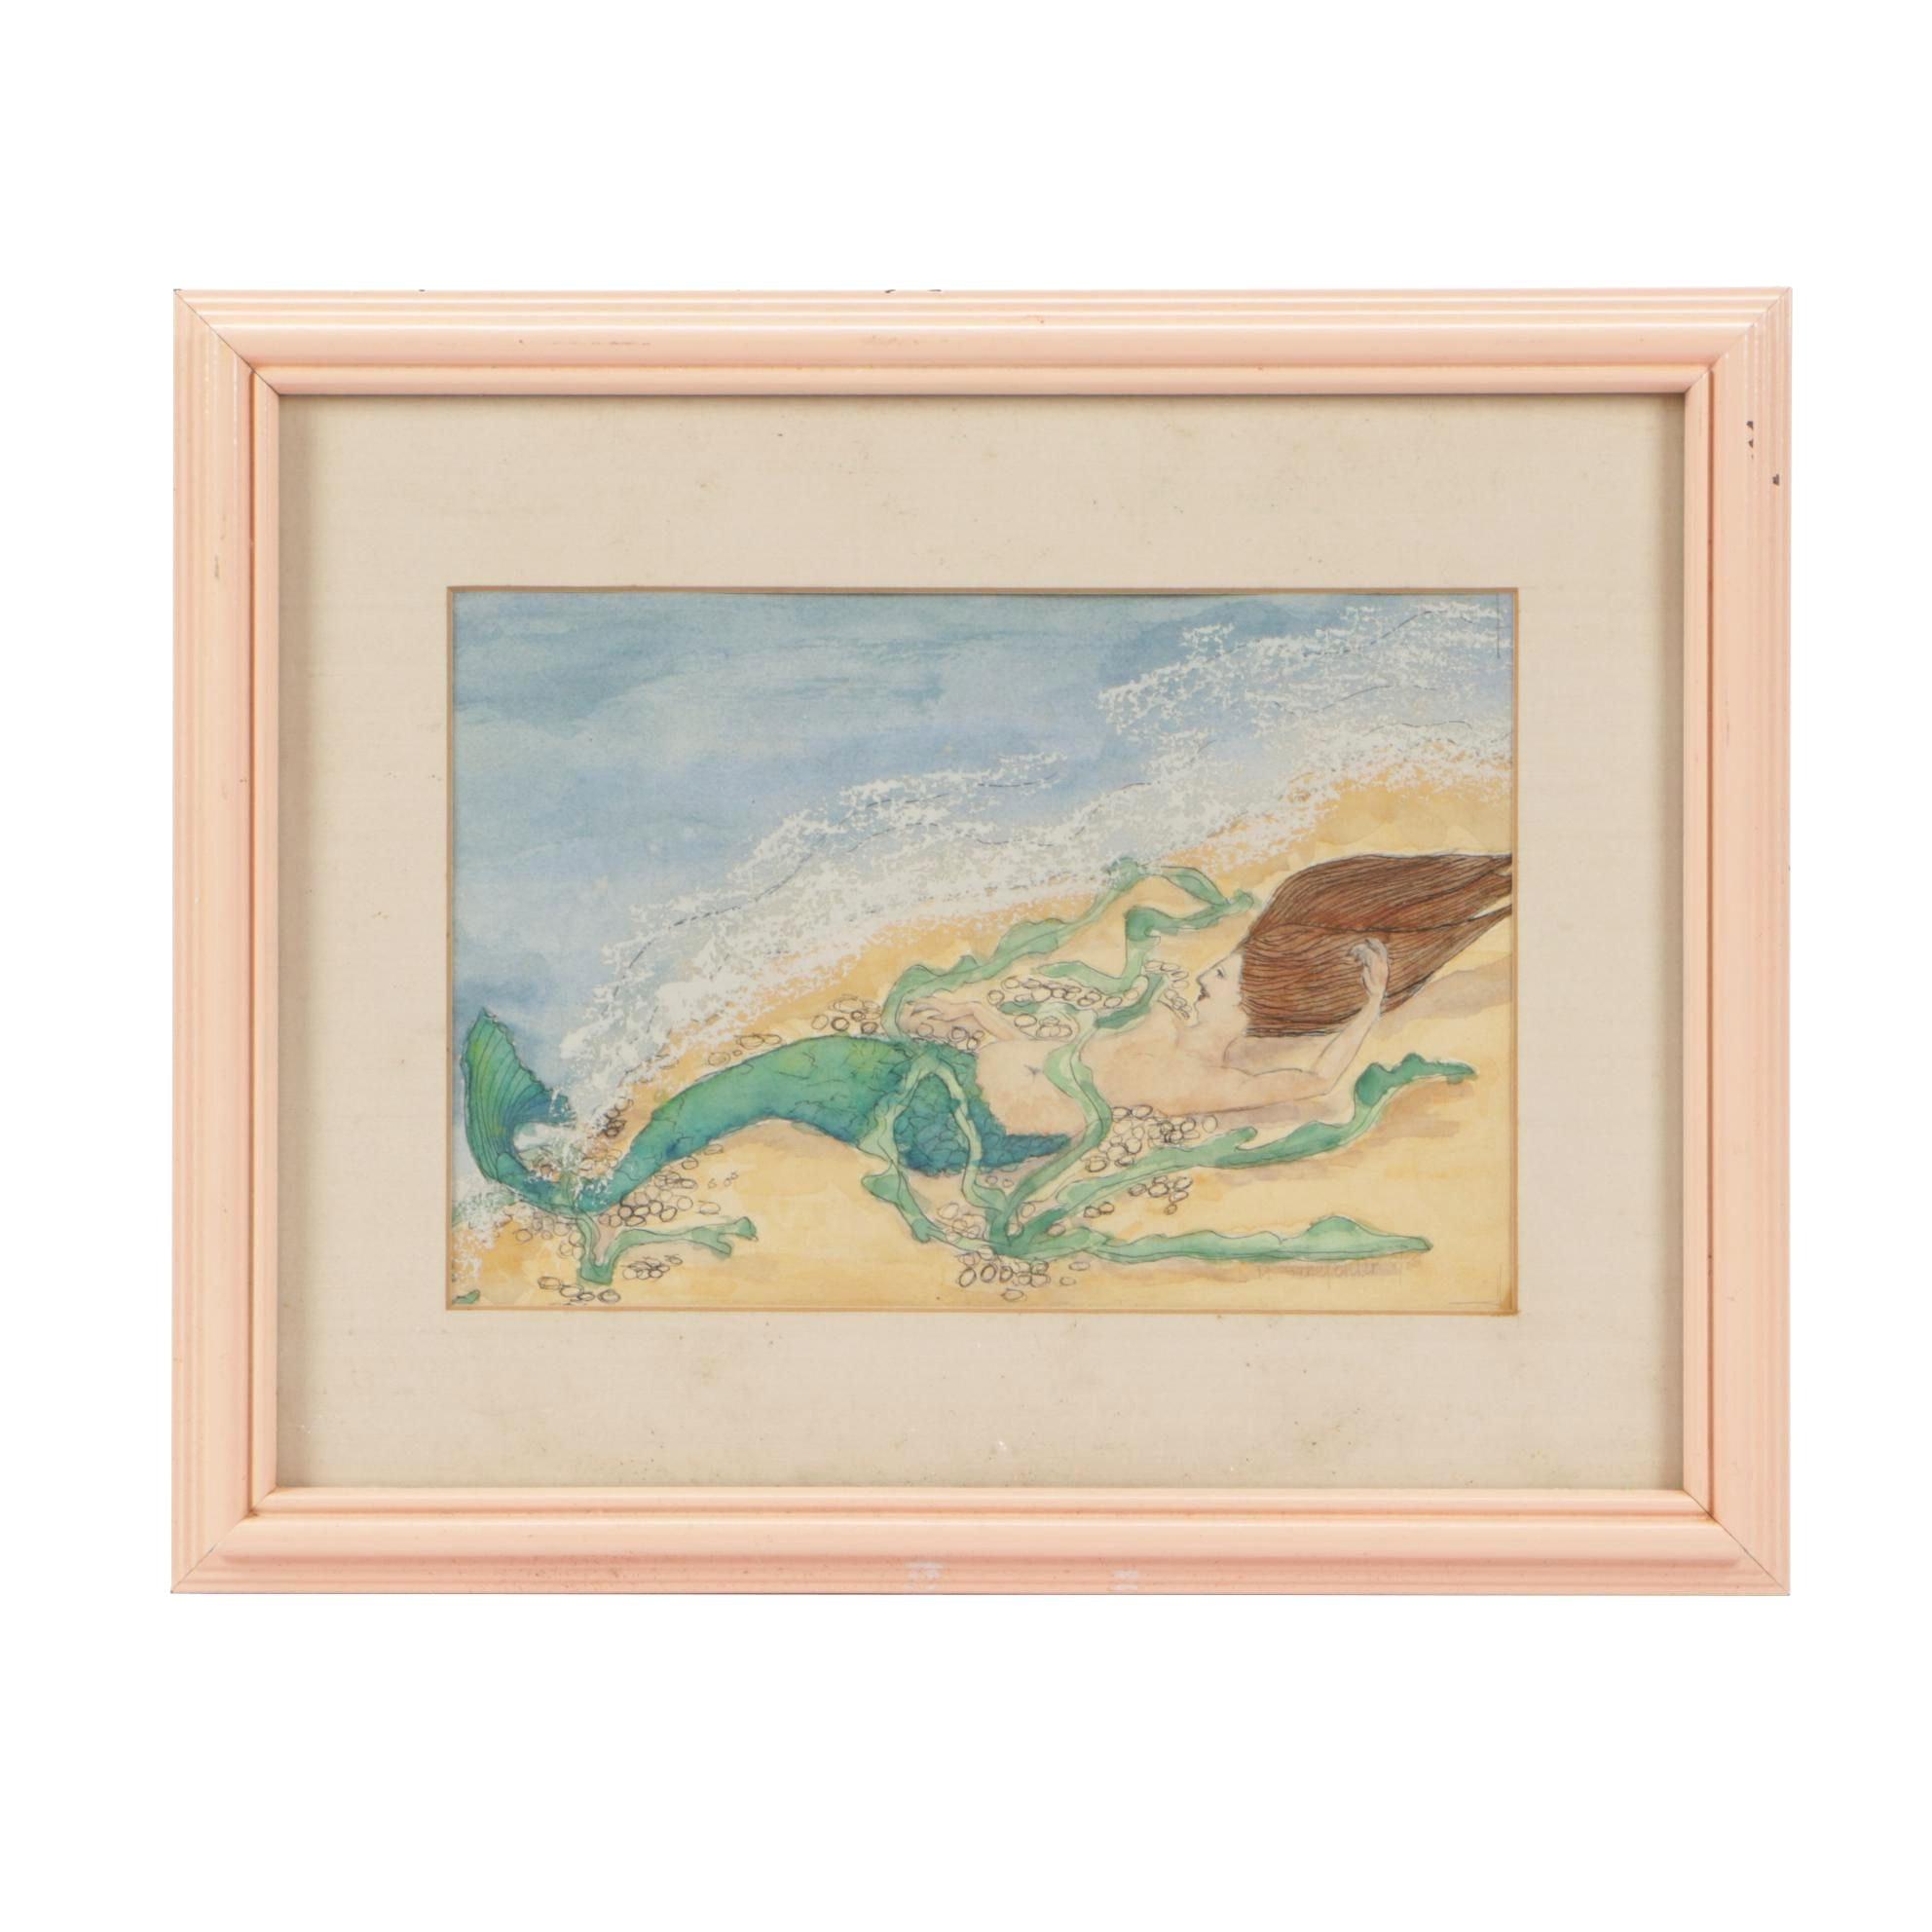 M. Schepohler 1982 Gouache, Ink and Watercolor Mermaid Illustration